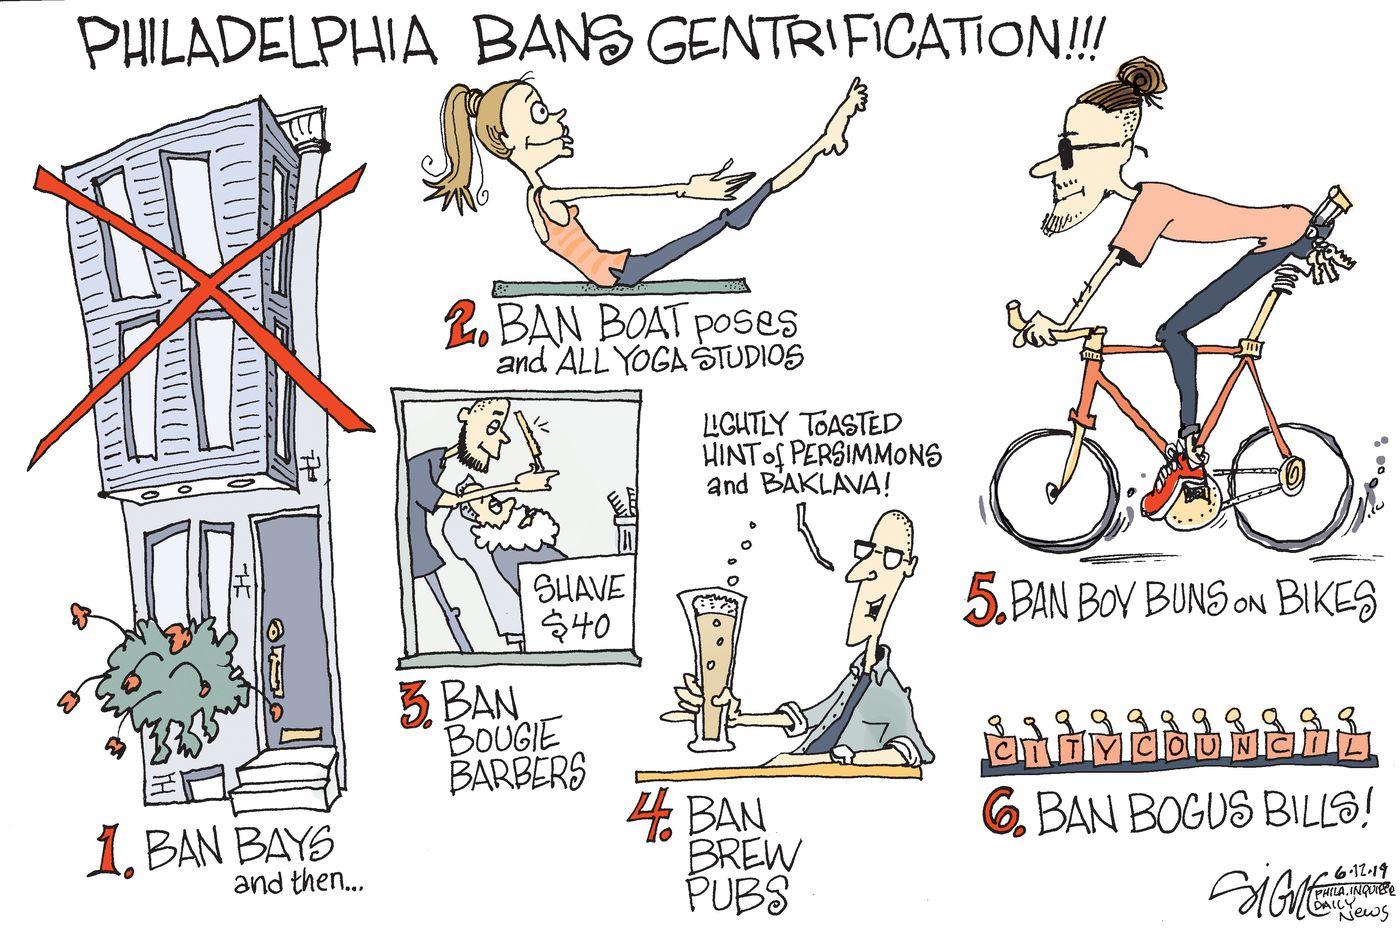 Political Cartoon: Philadelphia bans gentrification!